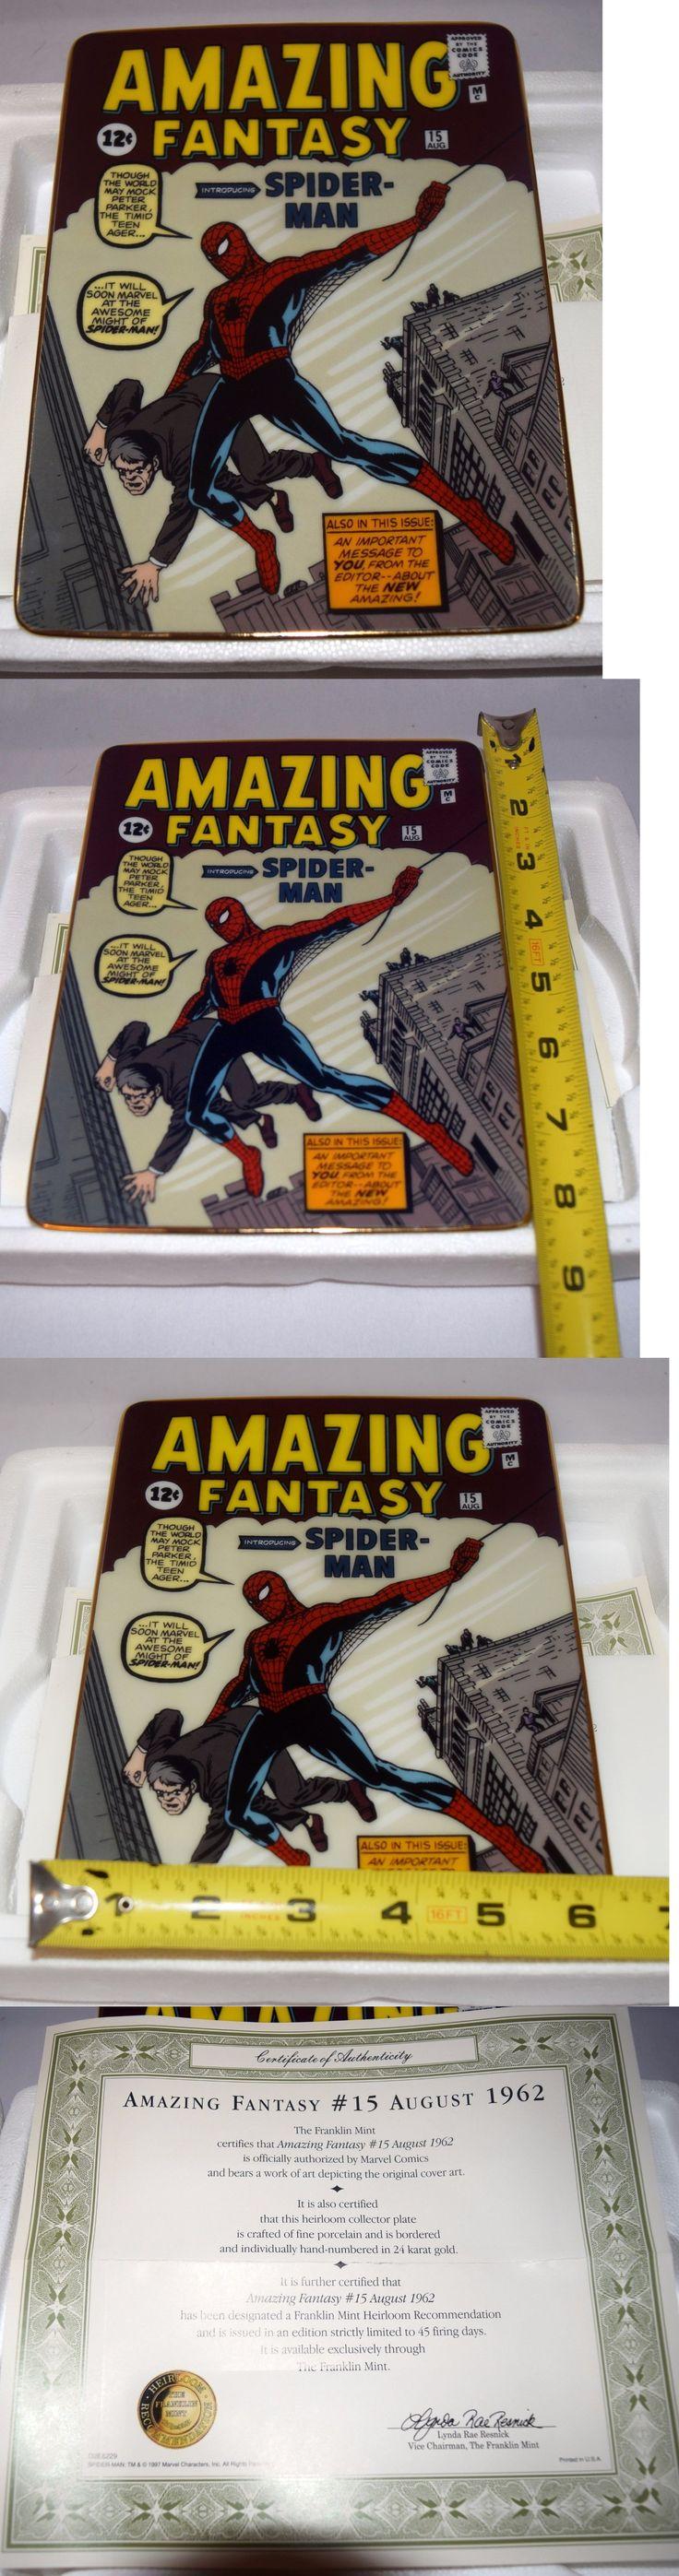 Spider-Man 146094: Franklin Mint Amazing Fantasy #15 Spider-Man Fine Porcelain Plate Limited Ha6140 -> BUY IT NOW ONLY: $69.99 on eBay!